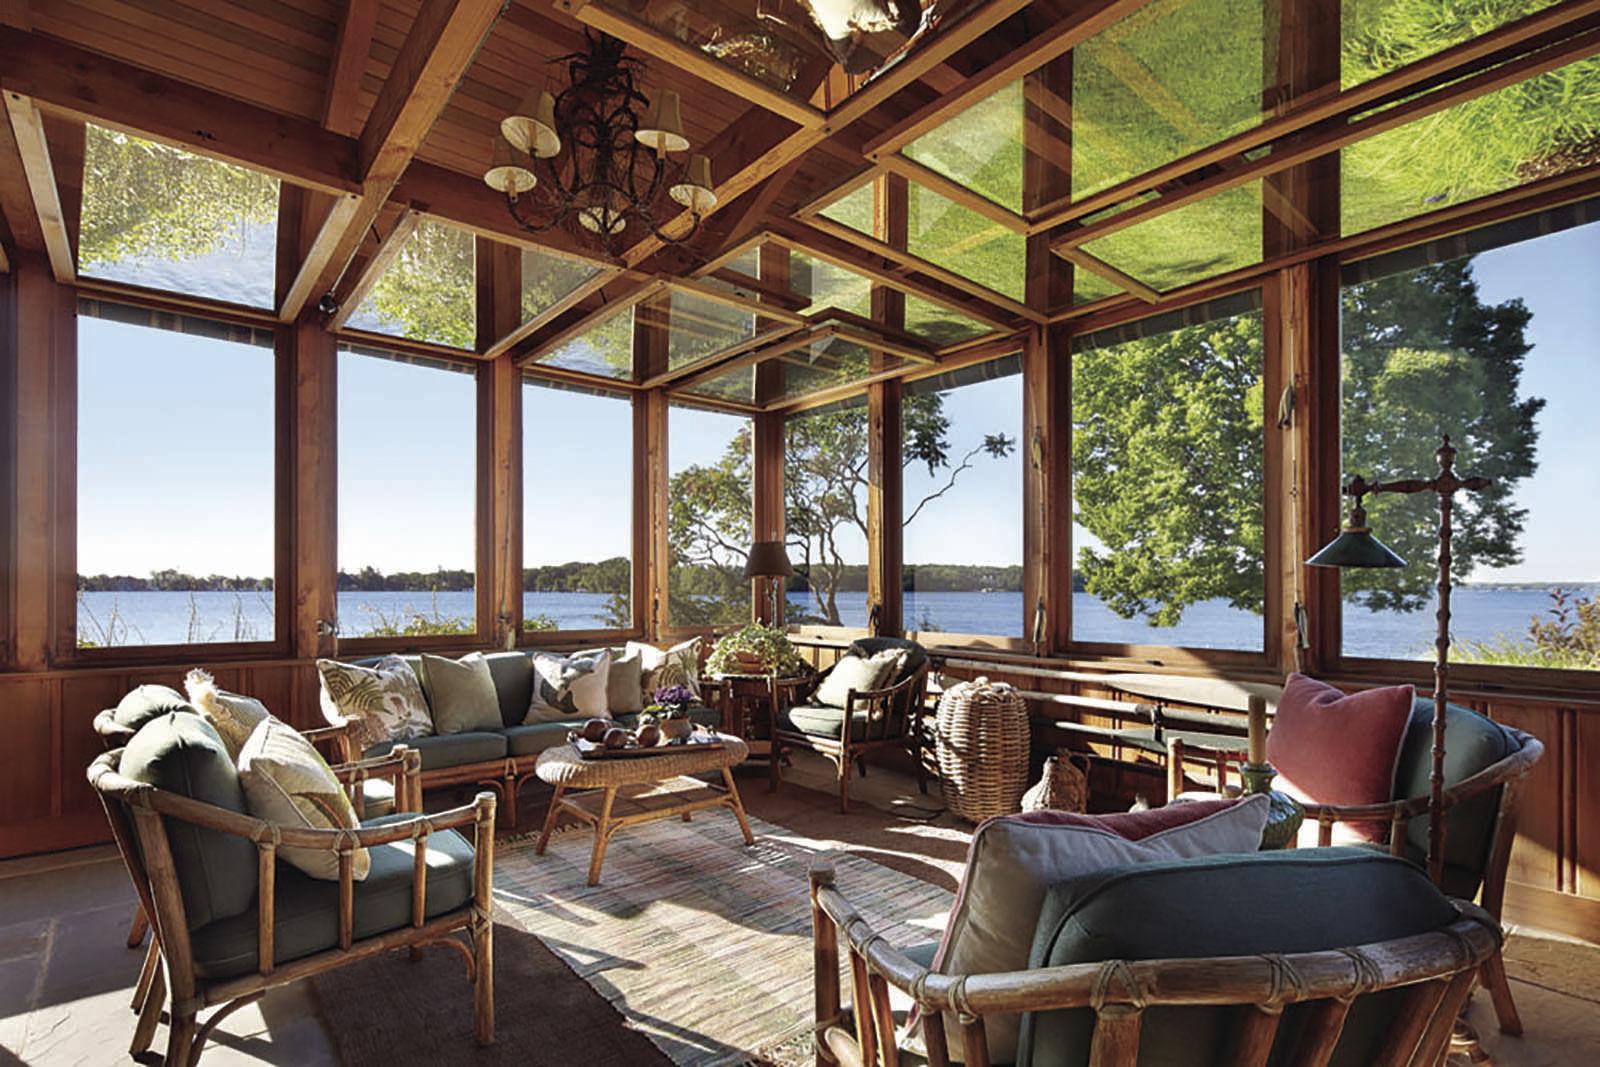 u0027Boathouses of Lake Minnetonkau0027 book launches May